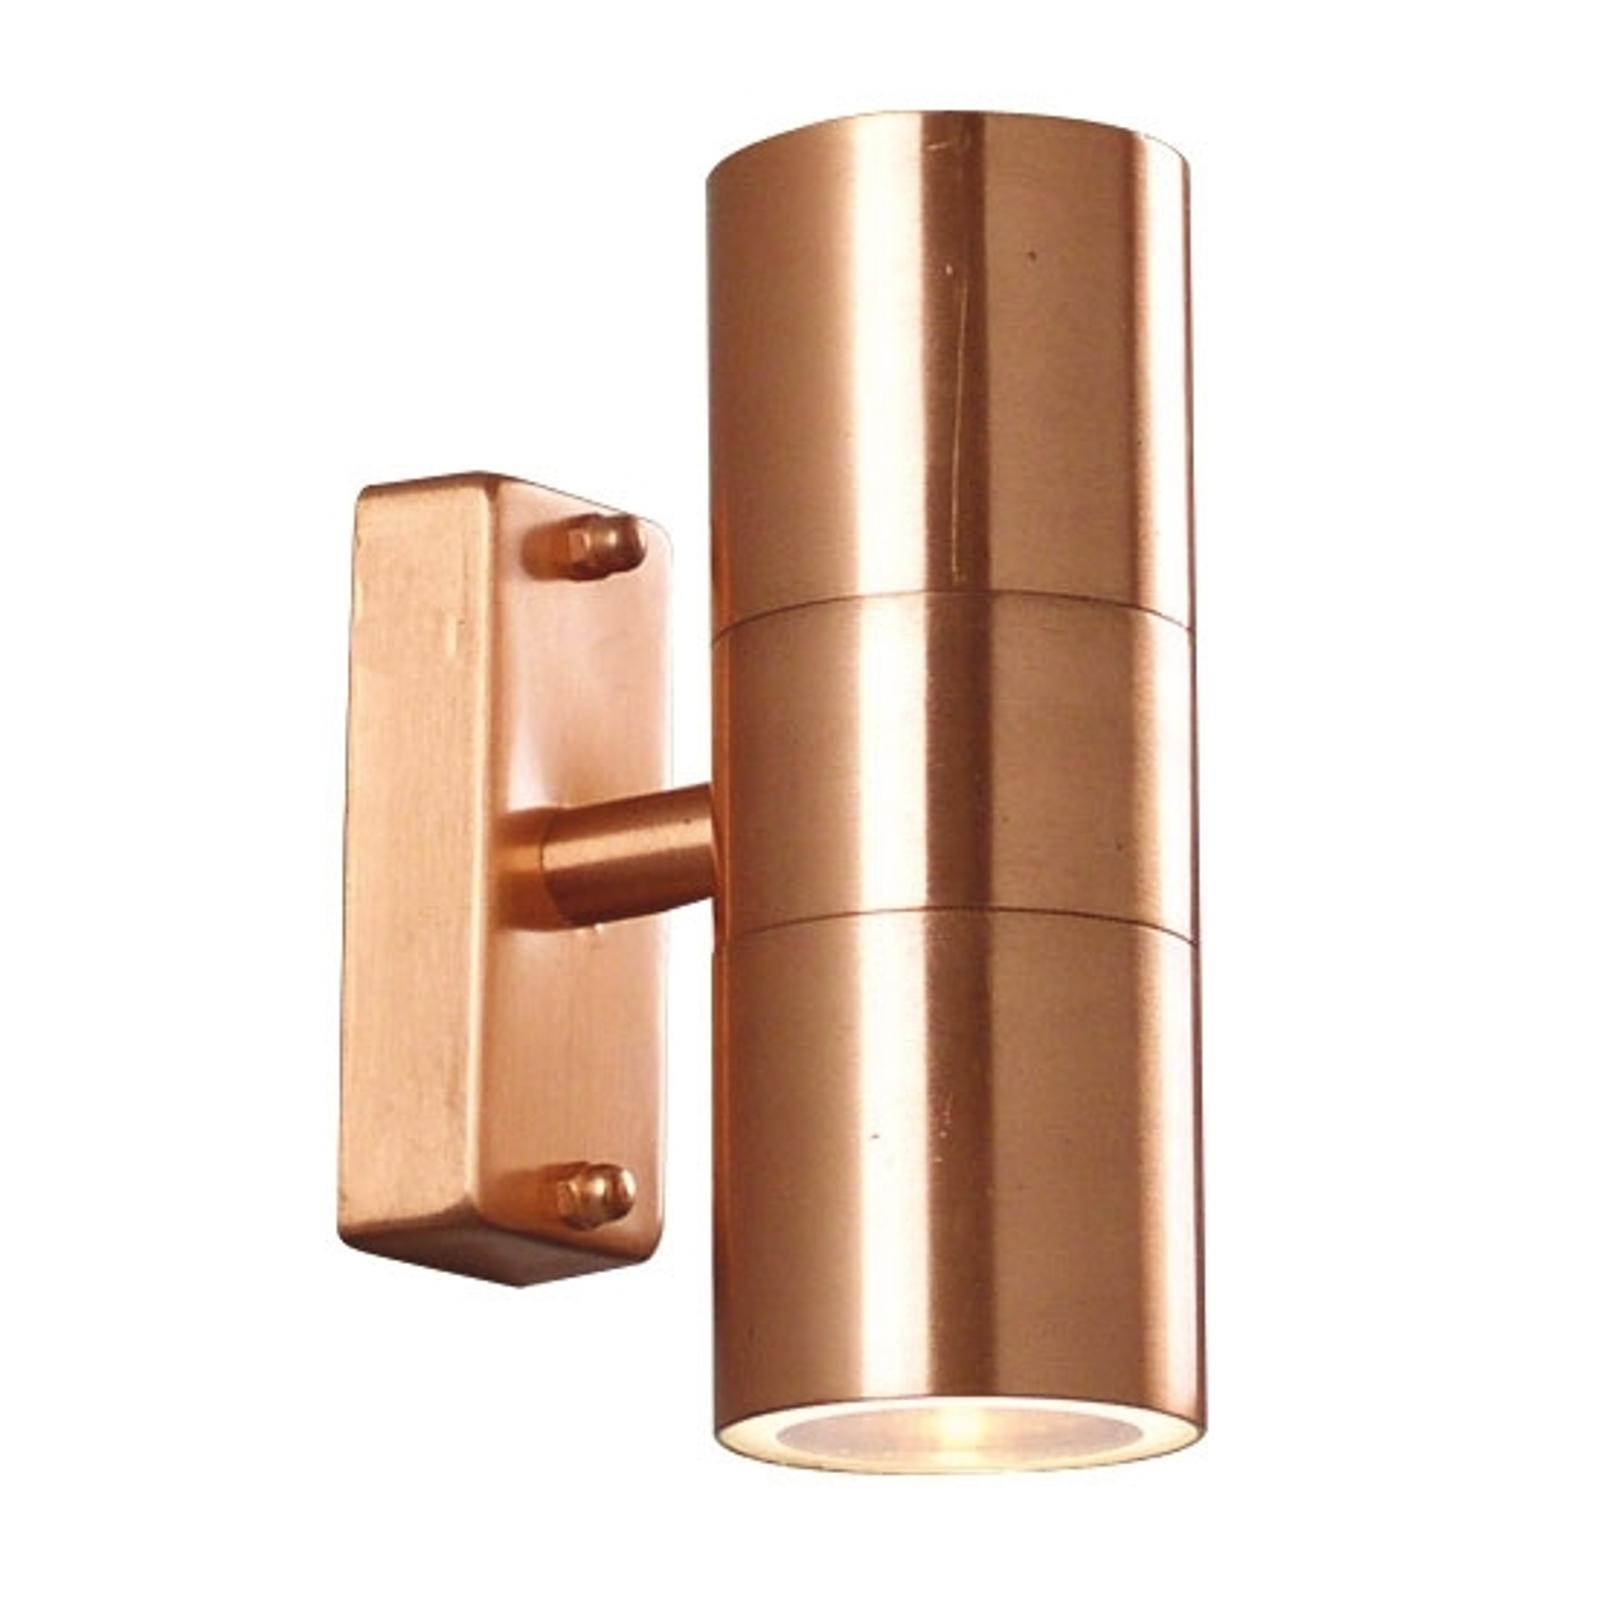 TIN Double wall kobberlampe